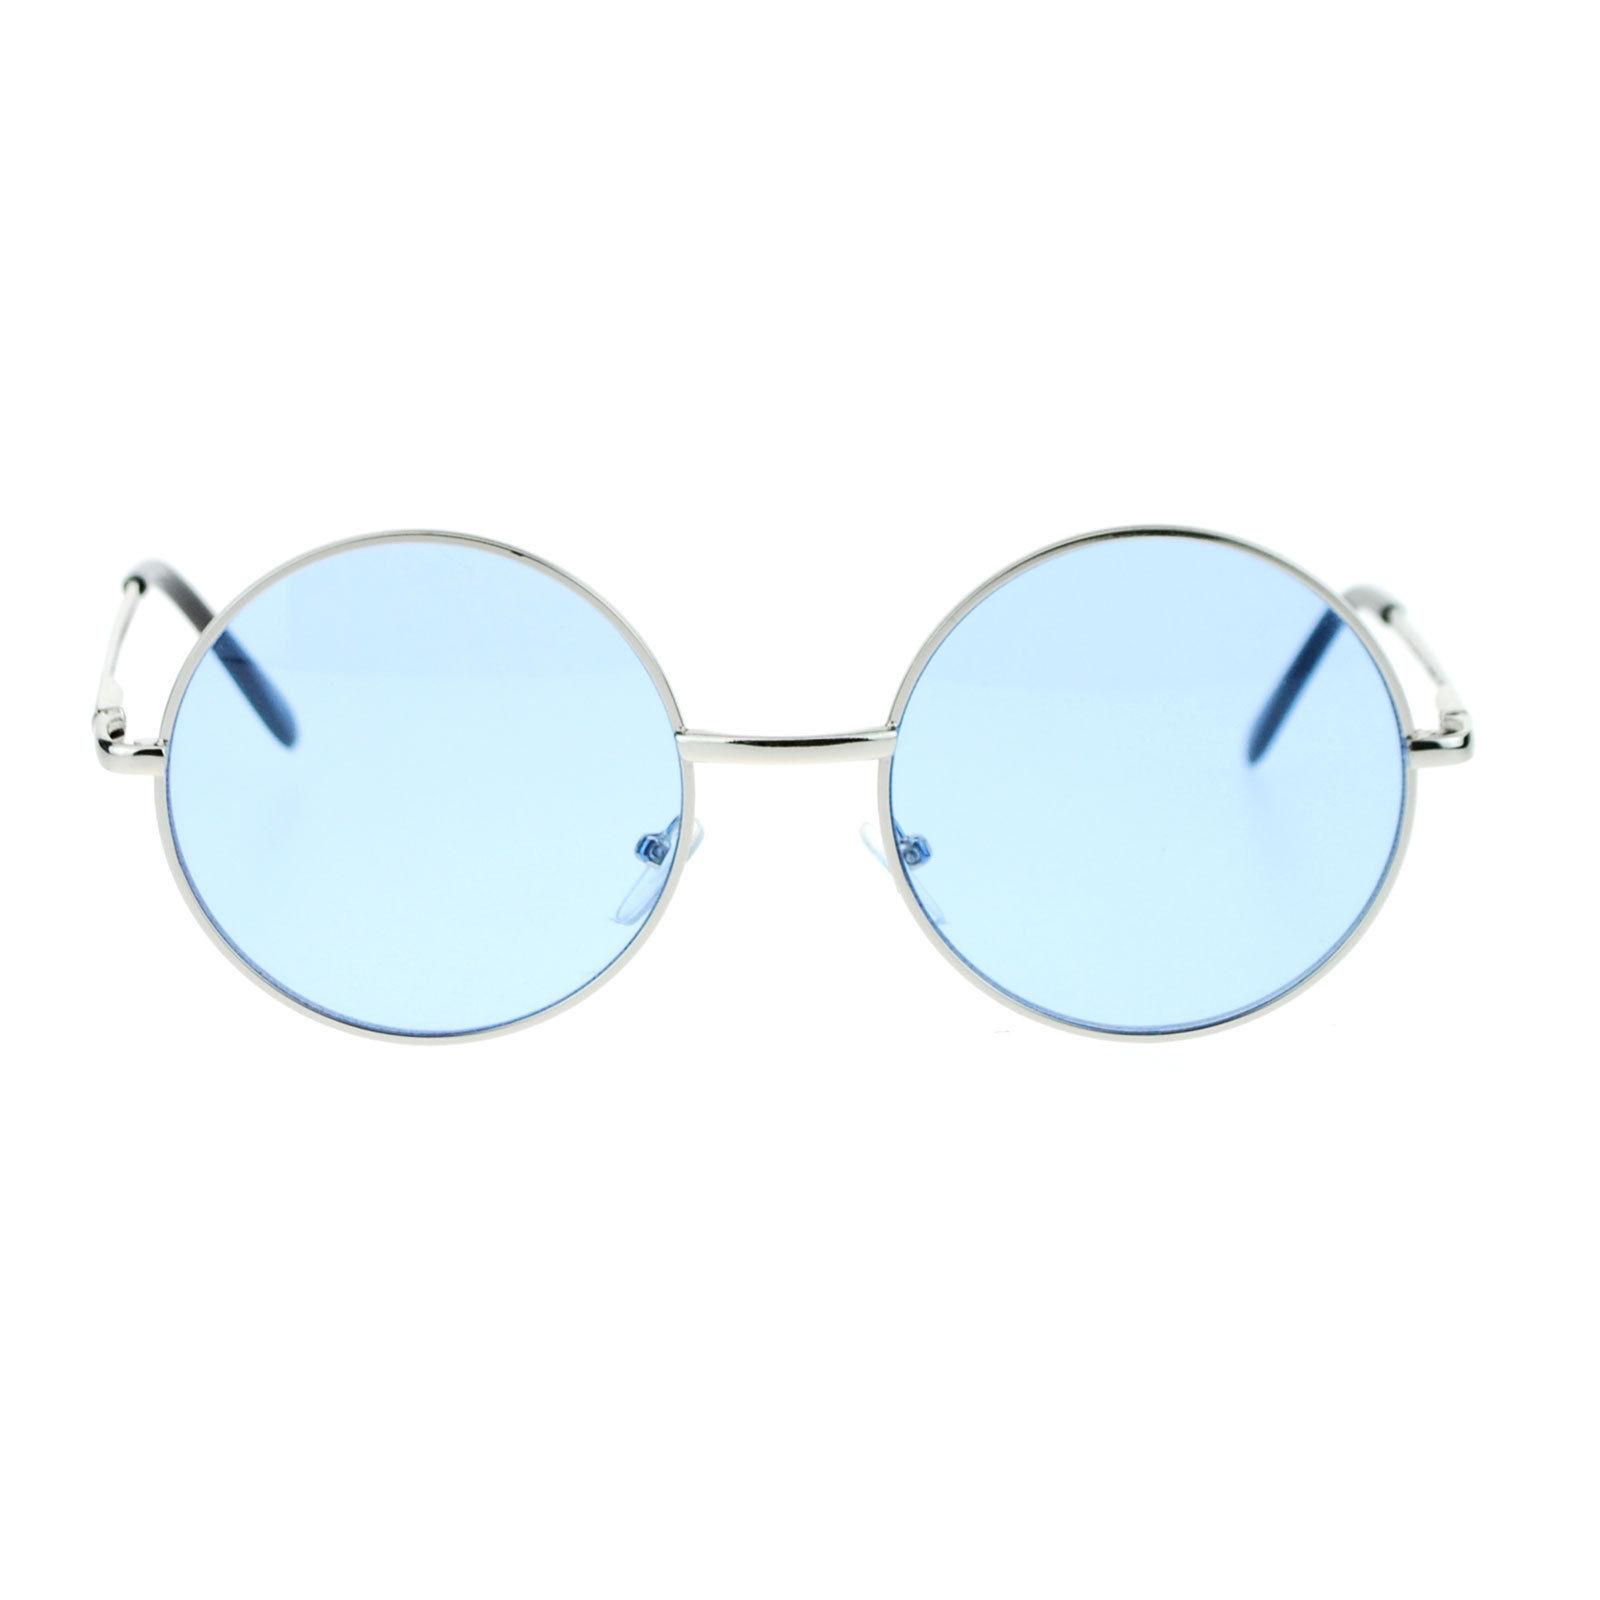 Unisex Sunglasses Round Circle Thin Metal Frame Spring Hinge Color Lens